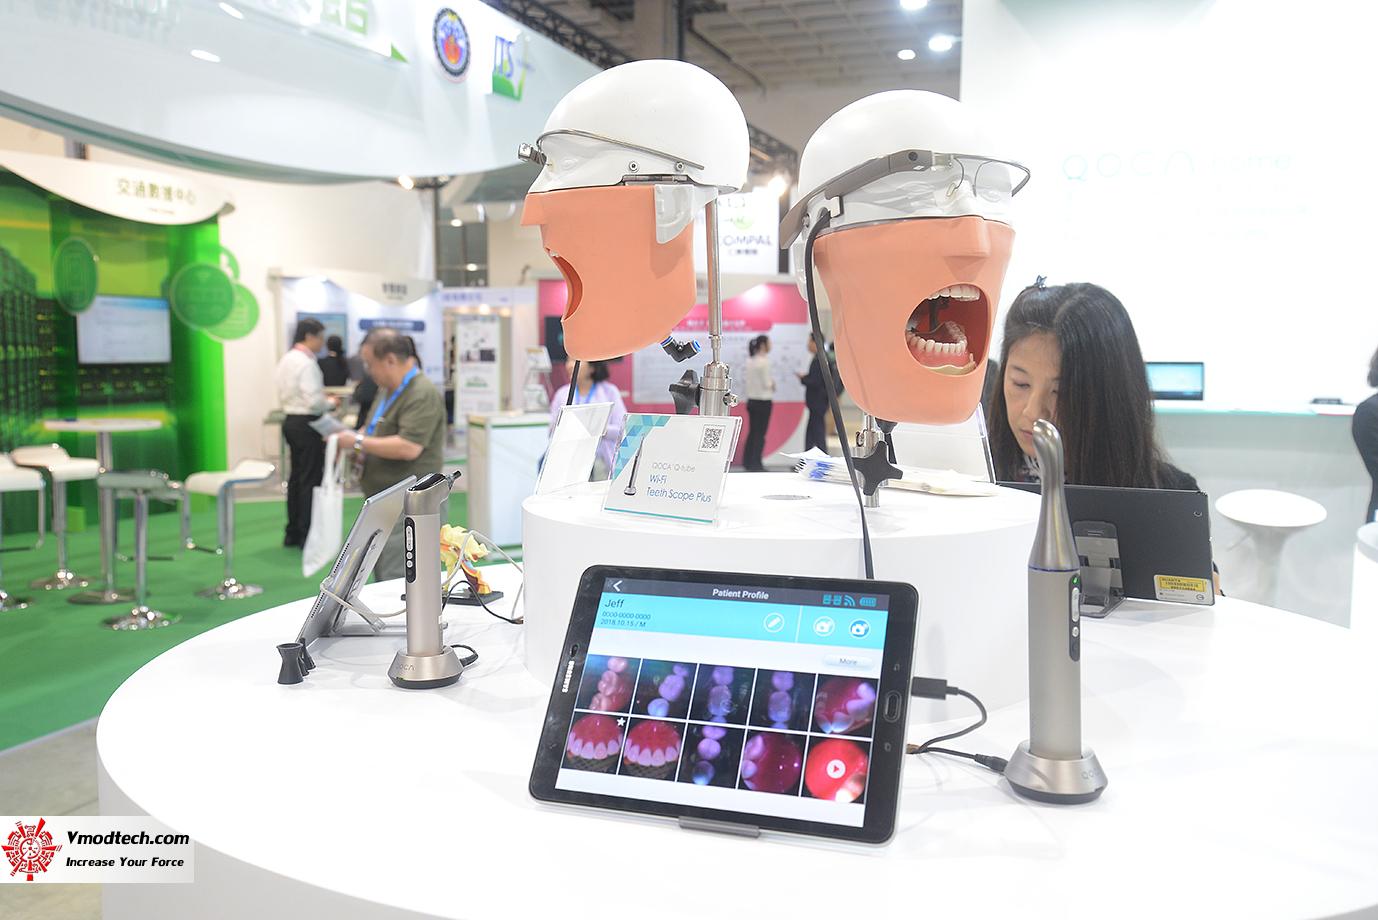 dsc 8900 เยี่ยมชมบูธ Smart Healthcare Expo กับเทคโนโลยีระบบการแพทย์และการดูแลสุขภาพอัจฉริยะในงาน 2019 SMART CITY SUMMIT & EXPO ณ กรุงไทเป ประเทศไต้หวัน